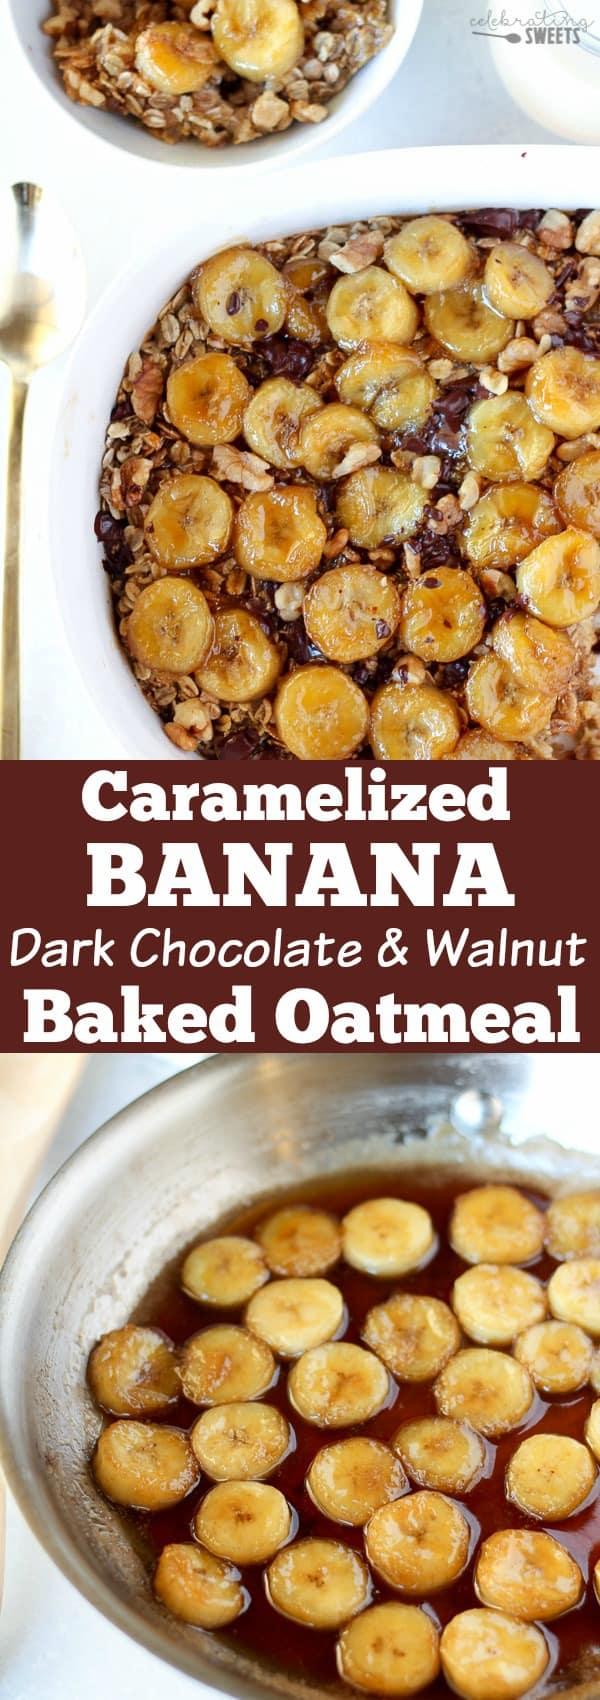 Caramelized Banana, Dark Chocolate & Walnut Baked Oatmeal